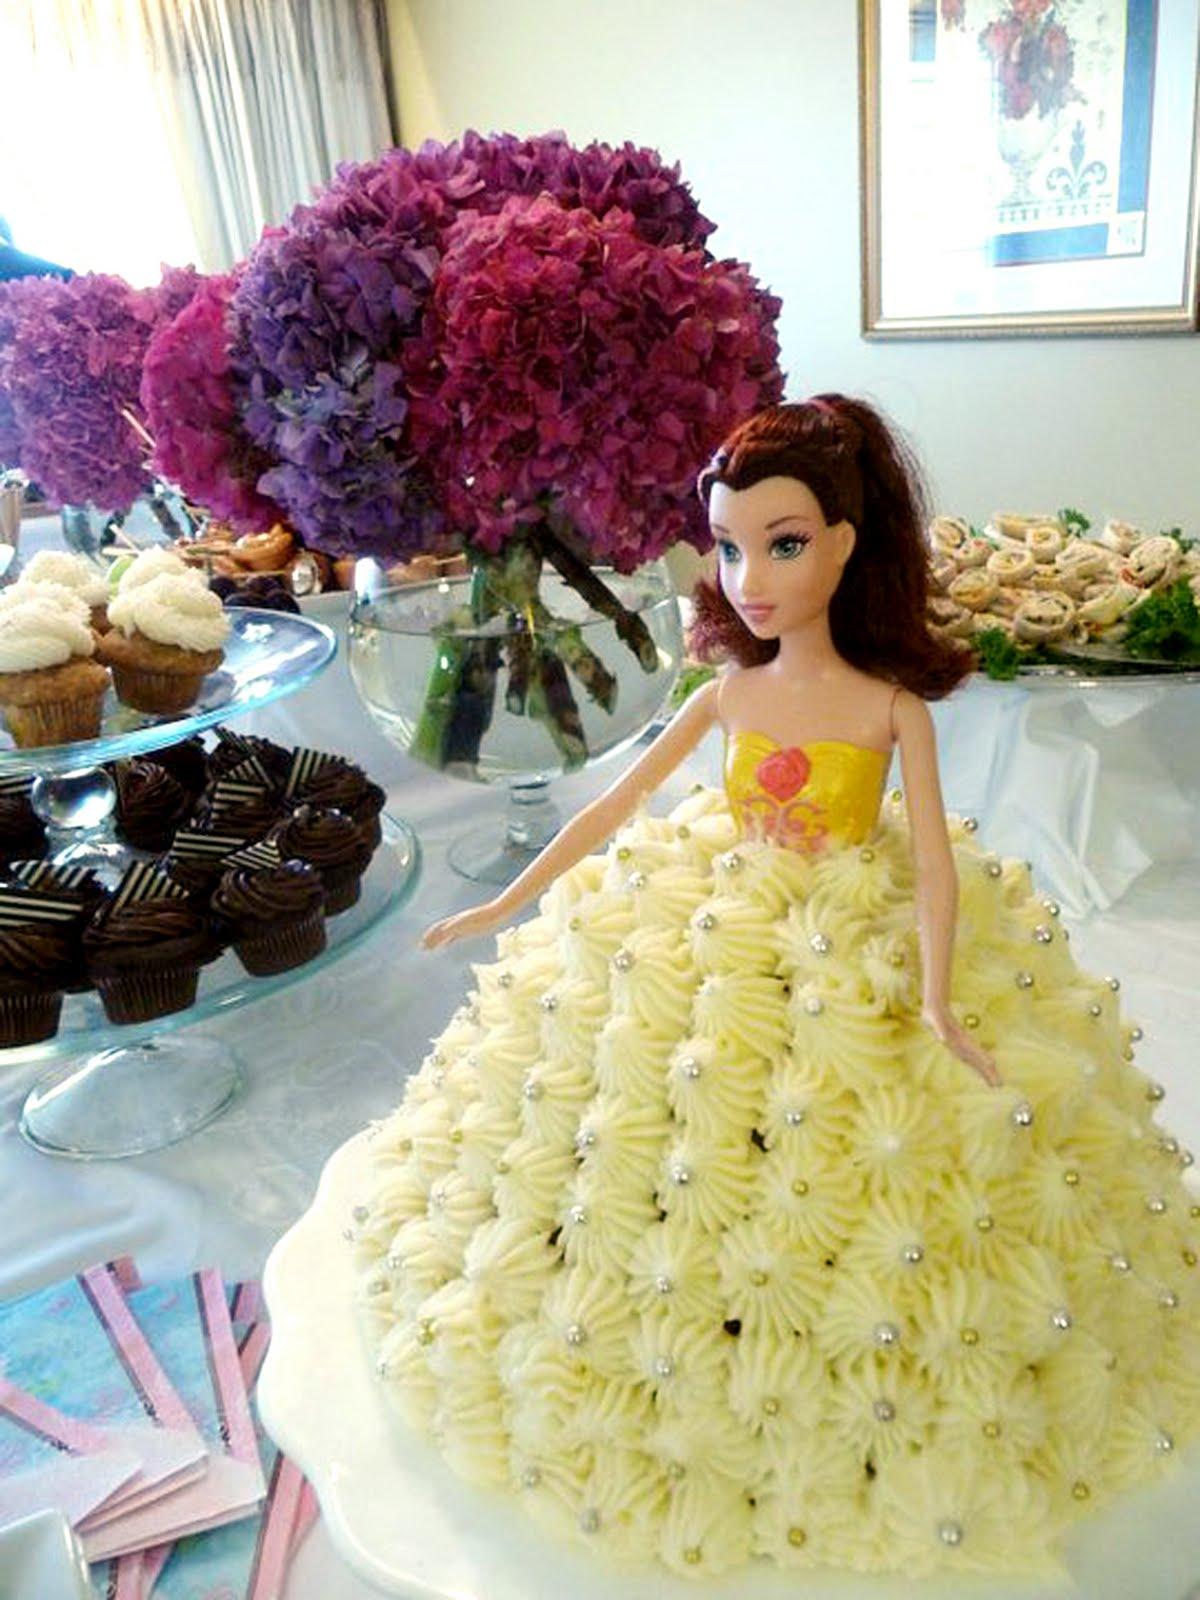 Cartoons Videos Barbie Princess Delicious And Tasty Cakes